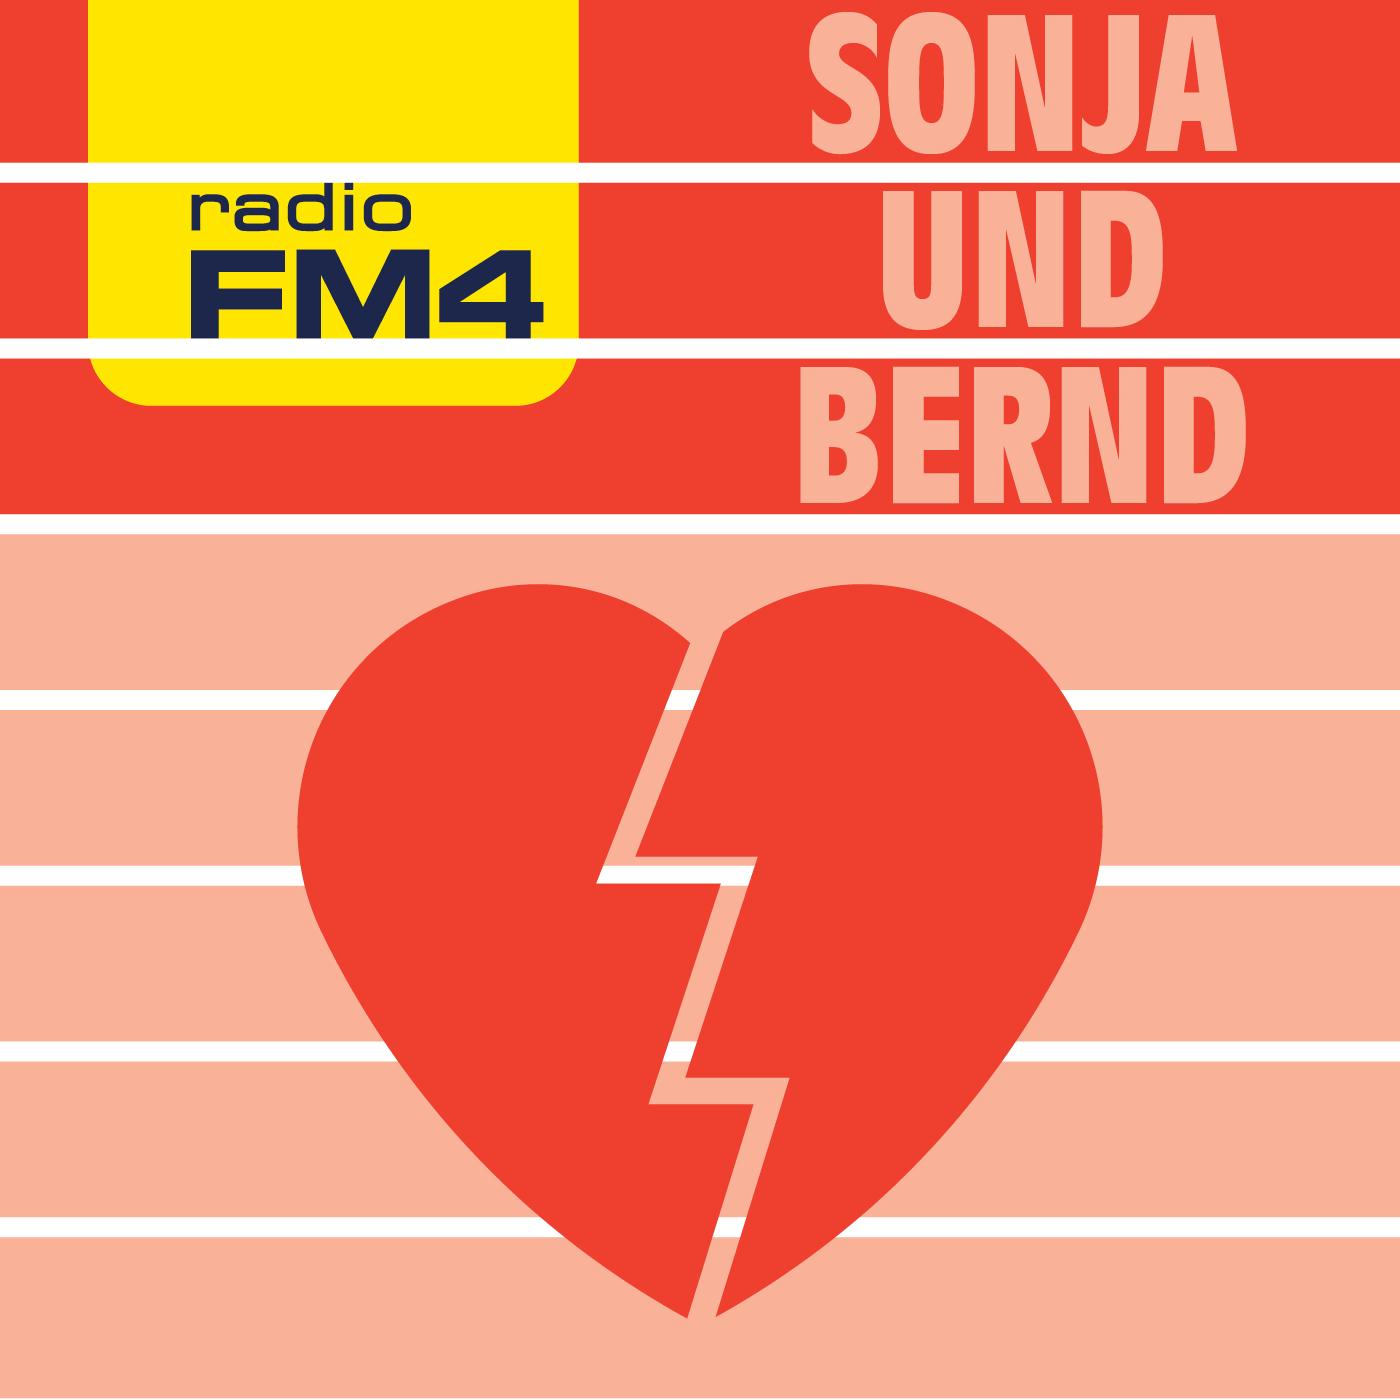 FM4 Sonja und Bernd